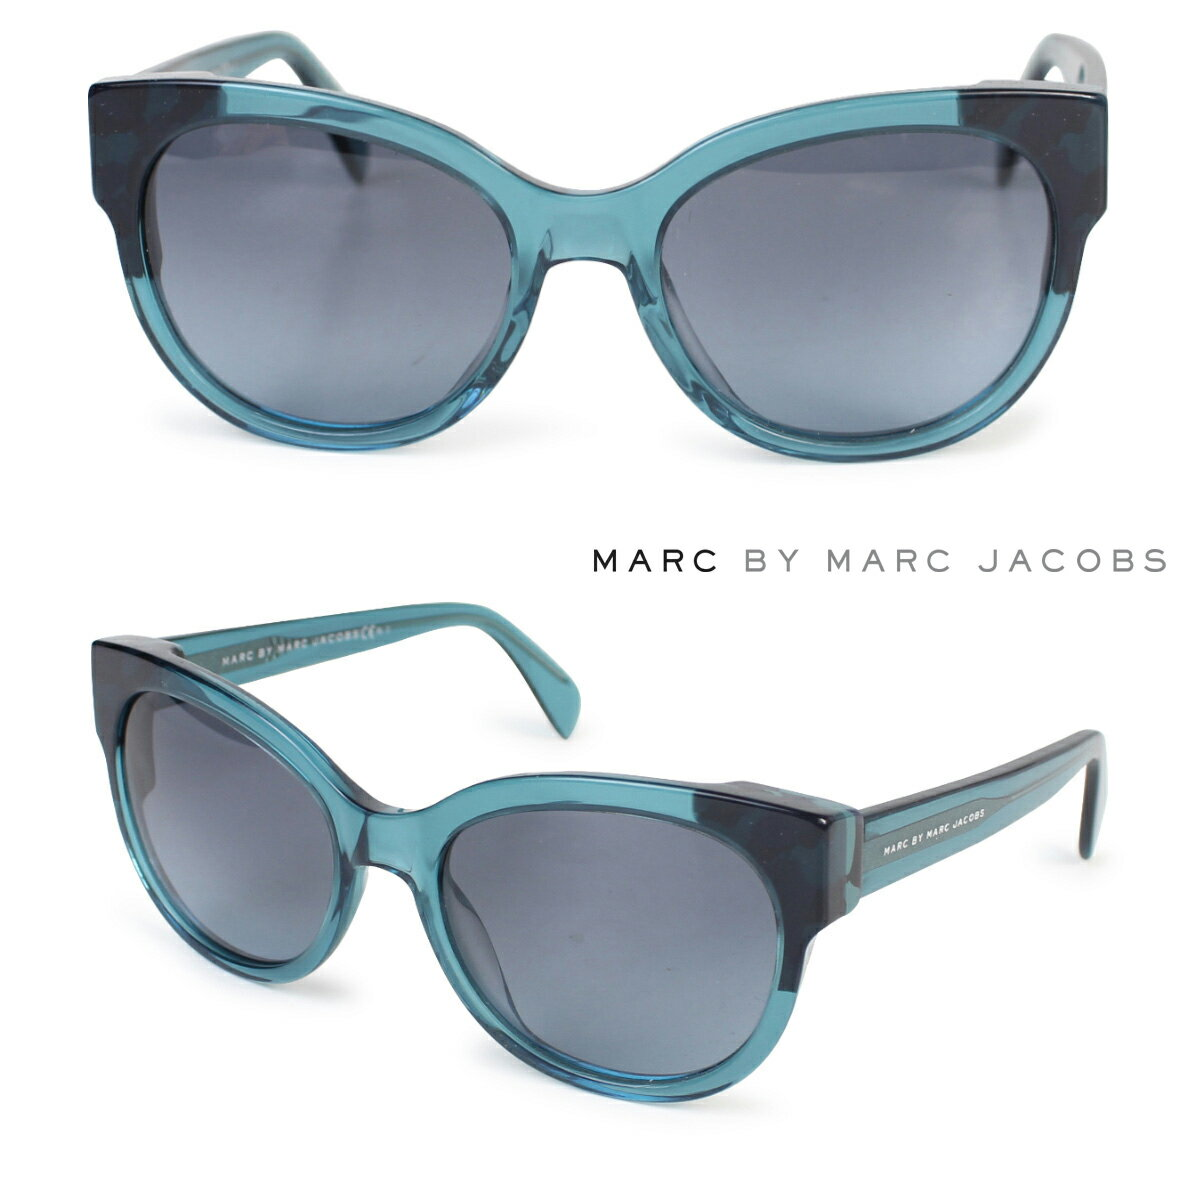 MARC BY MARC JACOBS マーク バイ マーク ジェイコブス サングラス レディース UVカット MMJ486/S ブルー